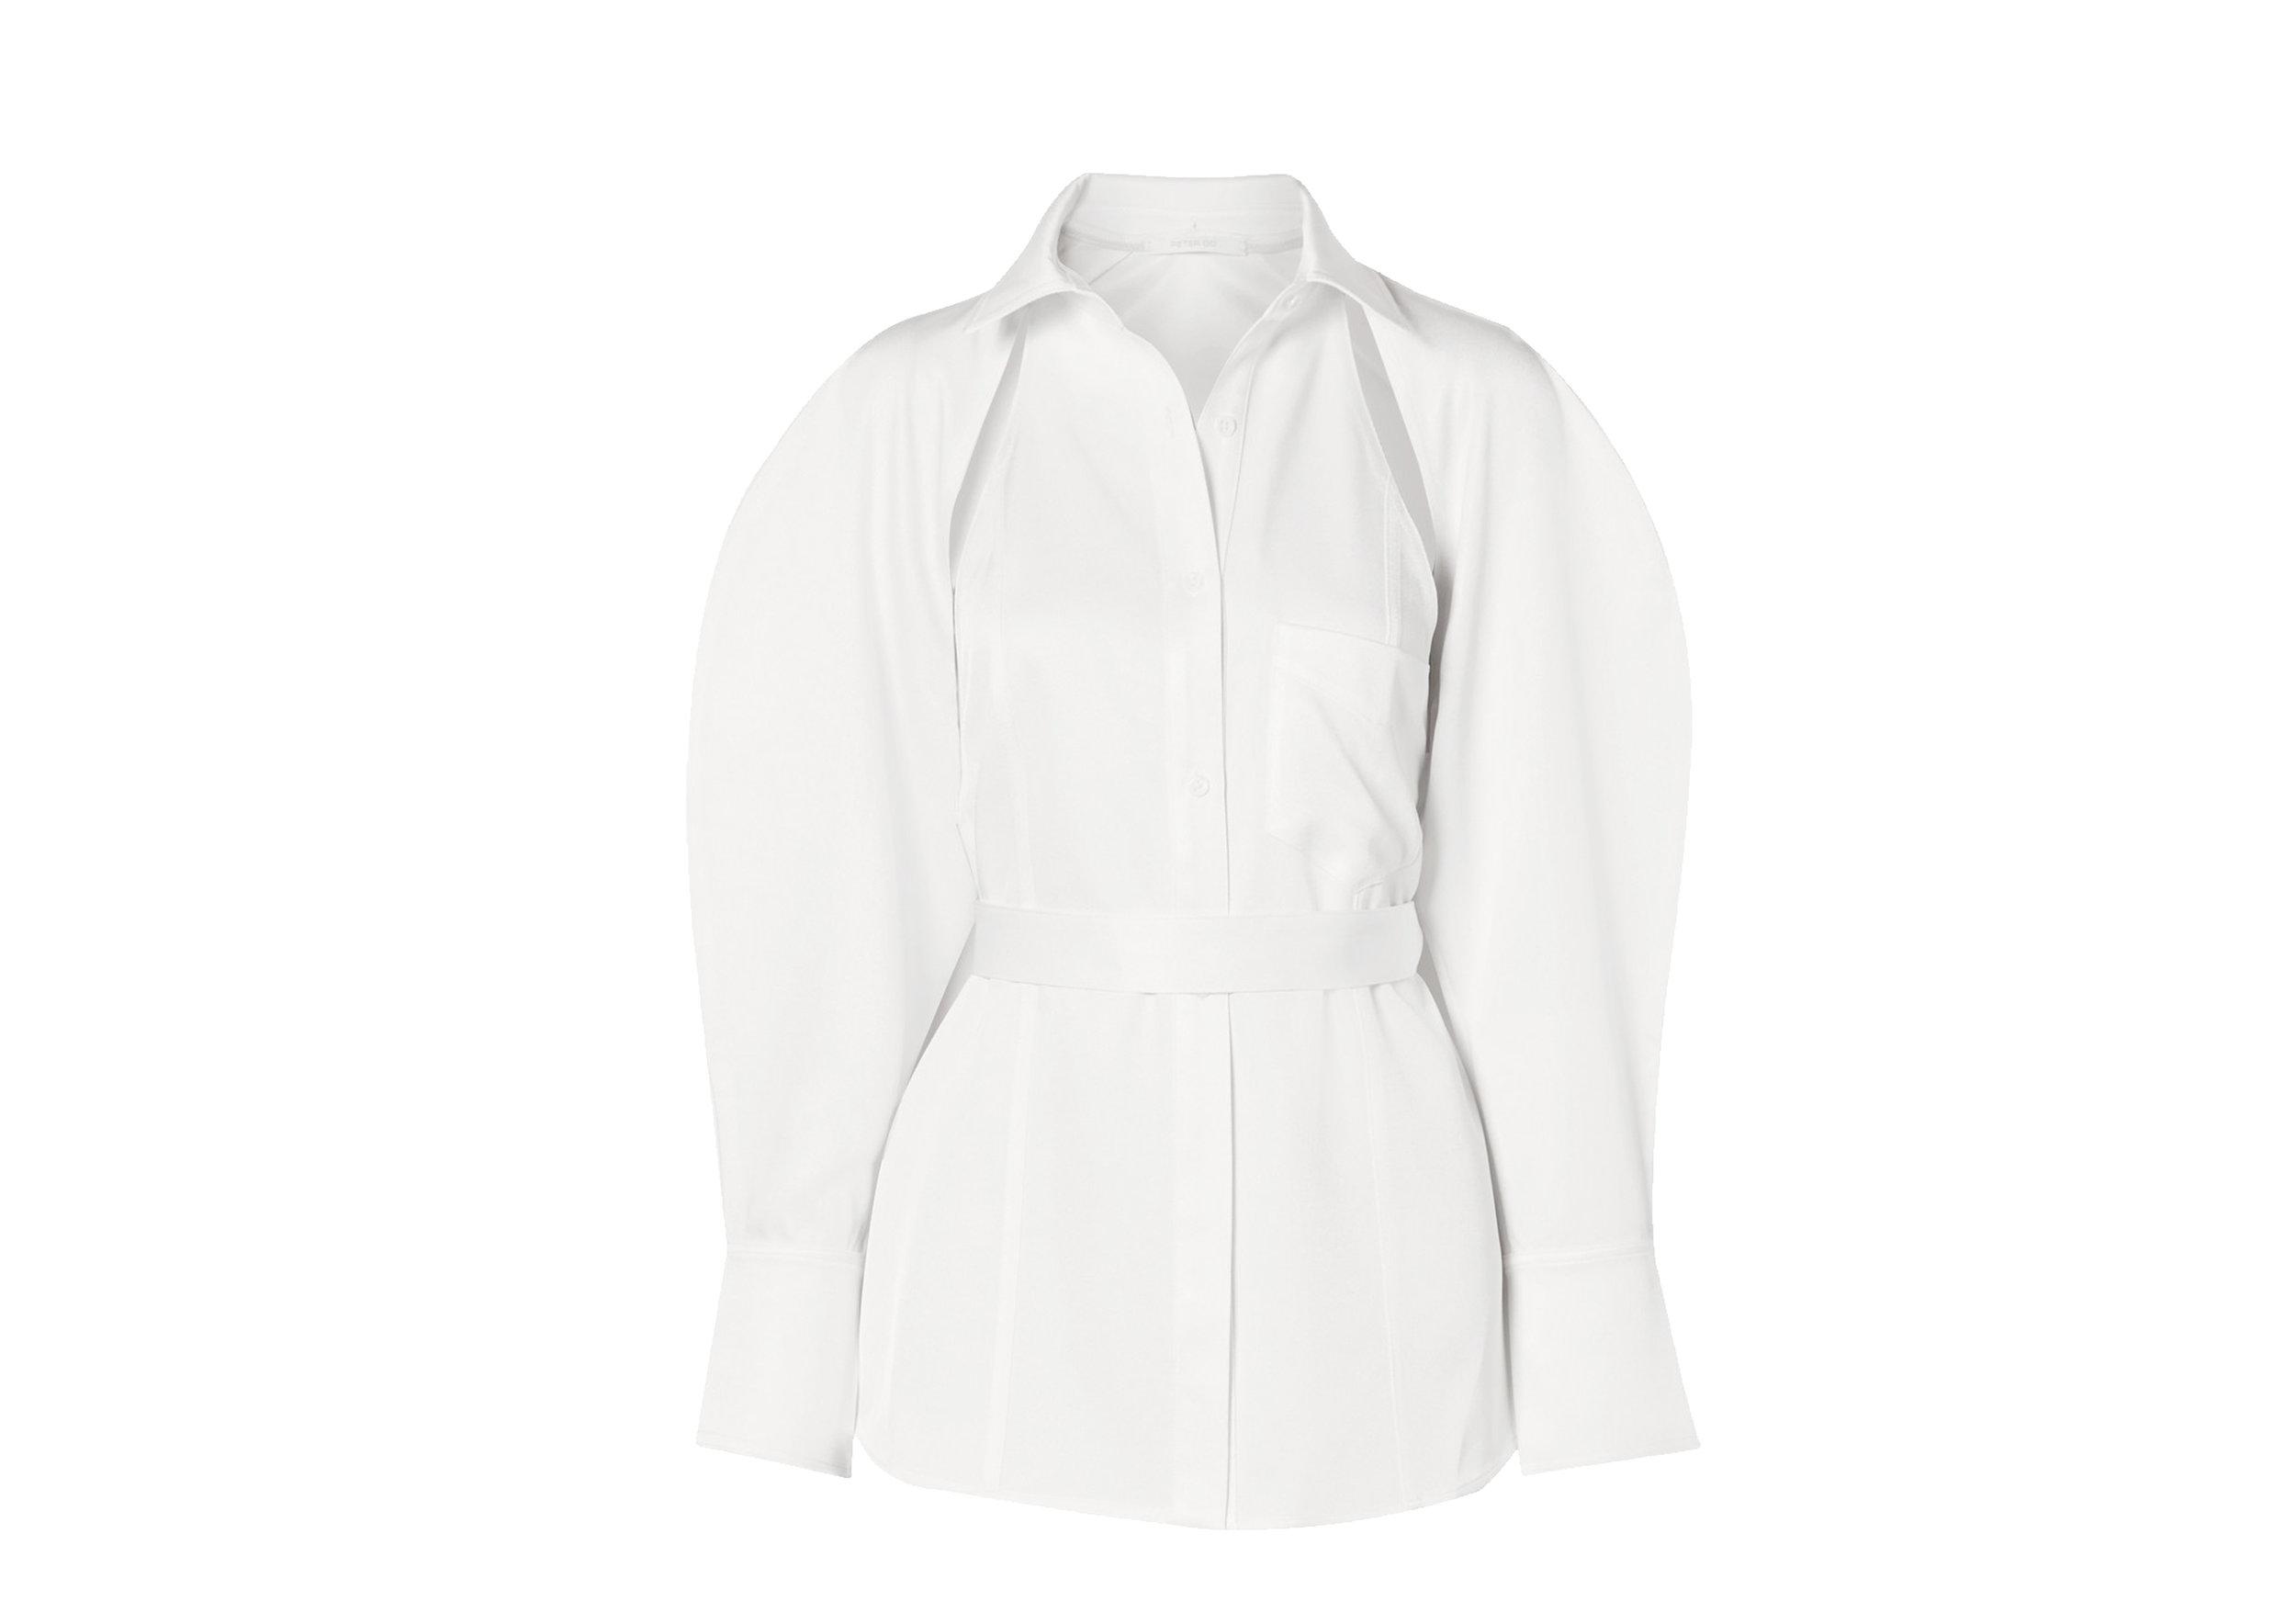 Peter Do - Convertible Satin-Twill Shirt, SGD 1,432